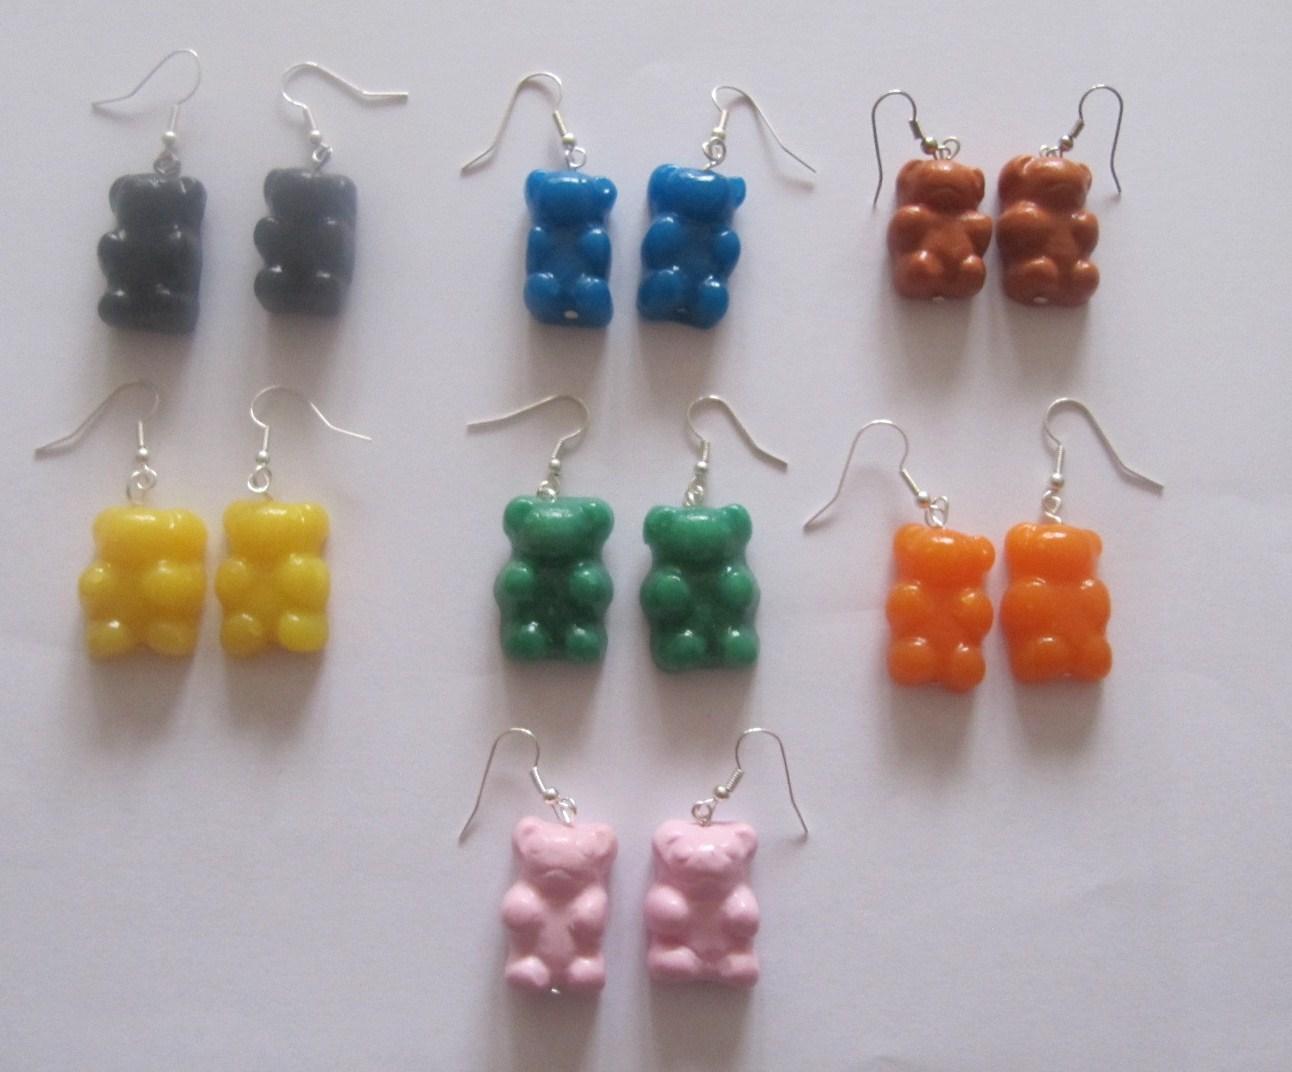 bijoux de cr 233 ation en p 226 te fimo bo bonbons nounours en fimo